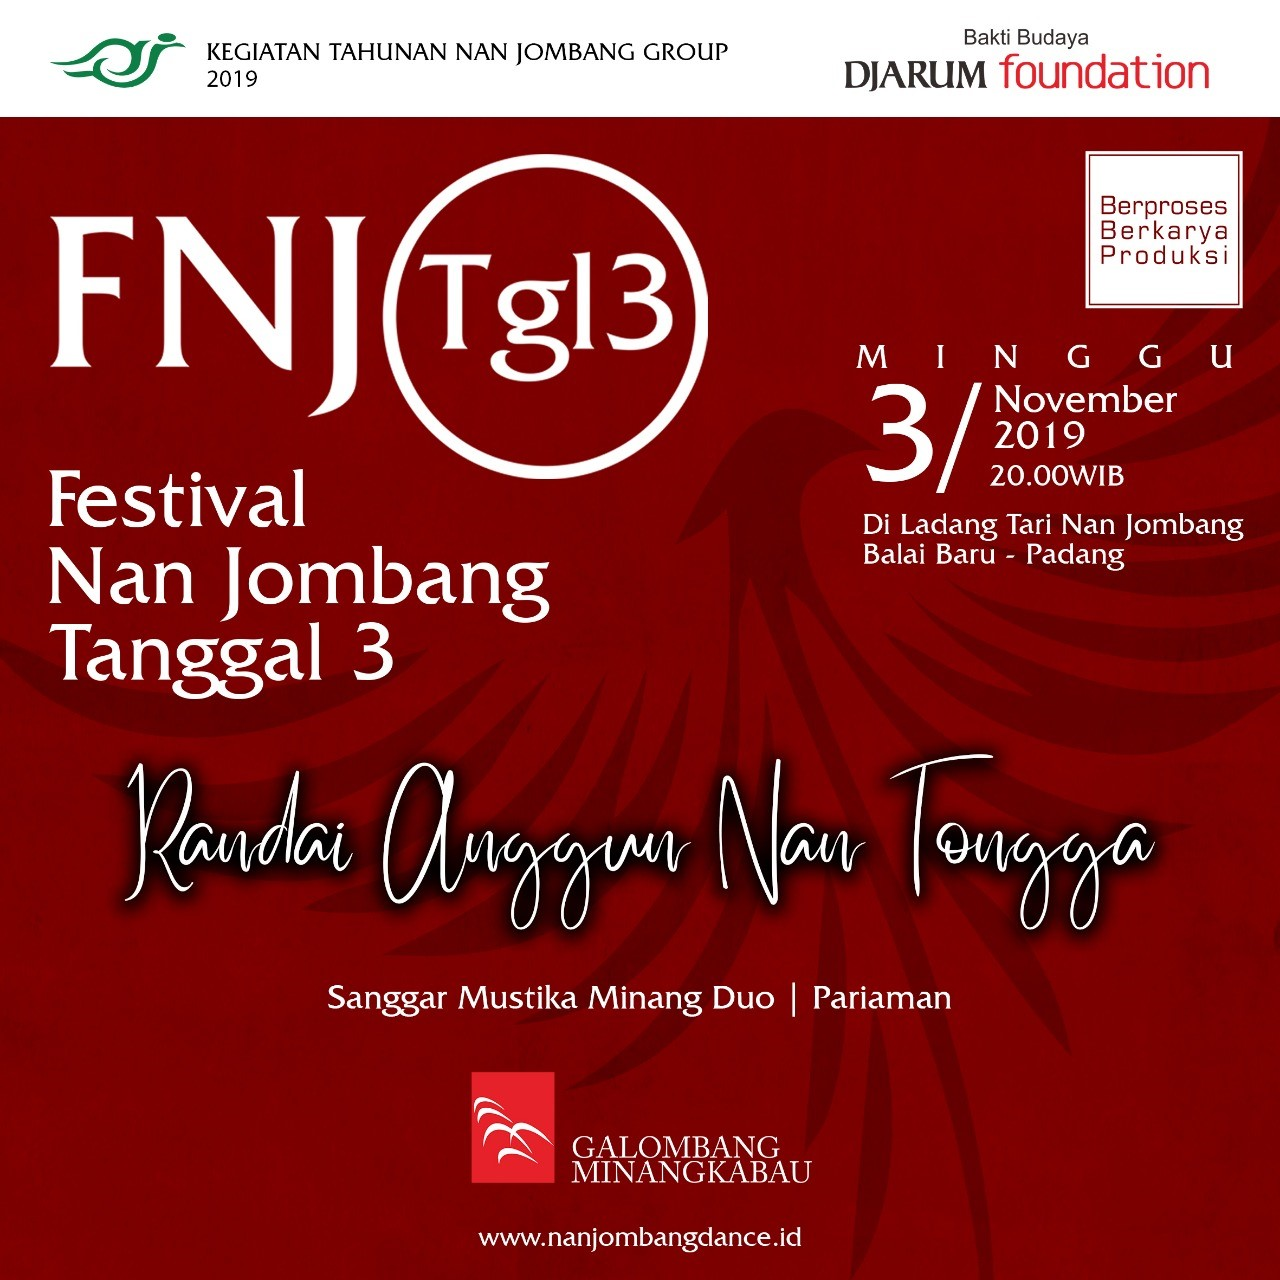 Pertunjukan Sanggar Mustika Minang Duo di Festival Nan Jombang